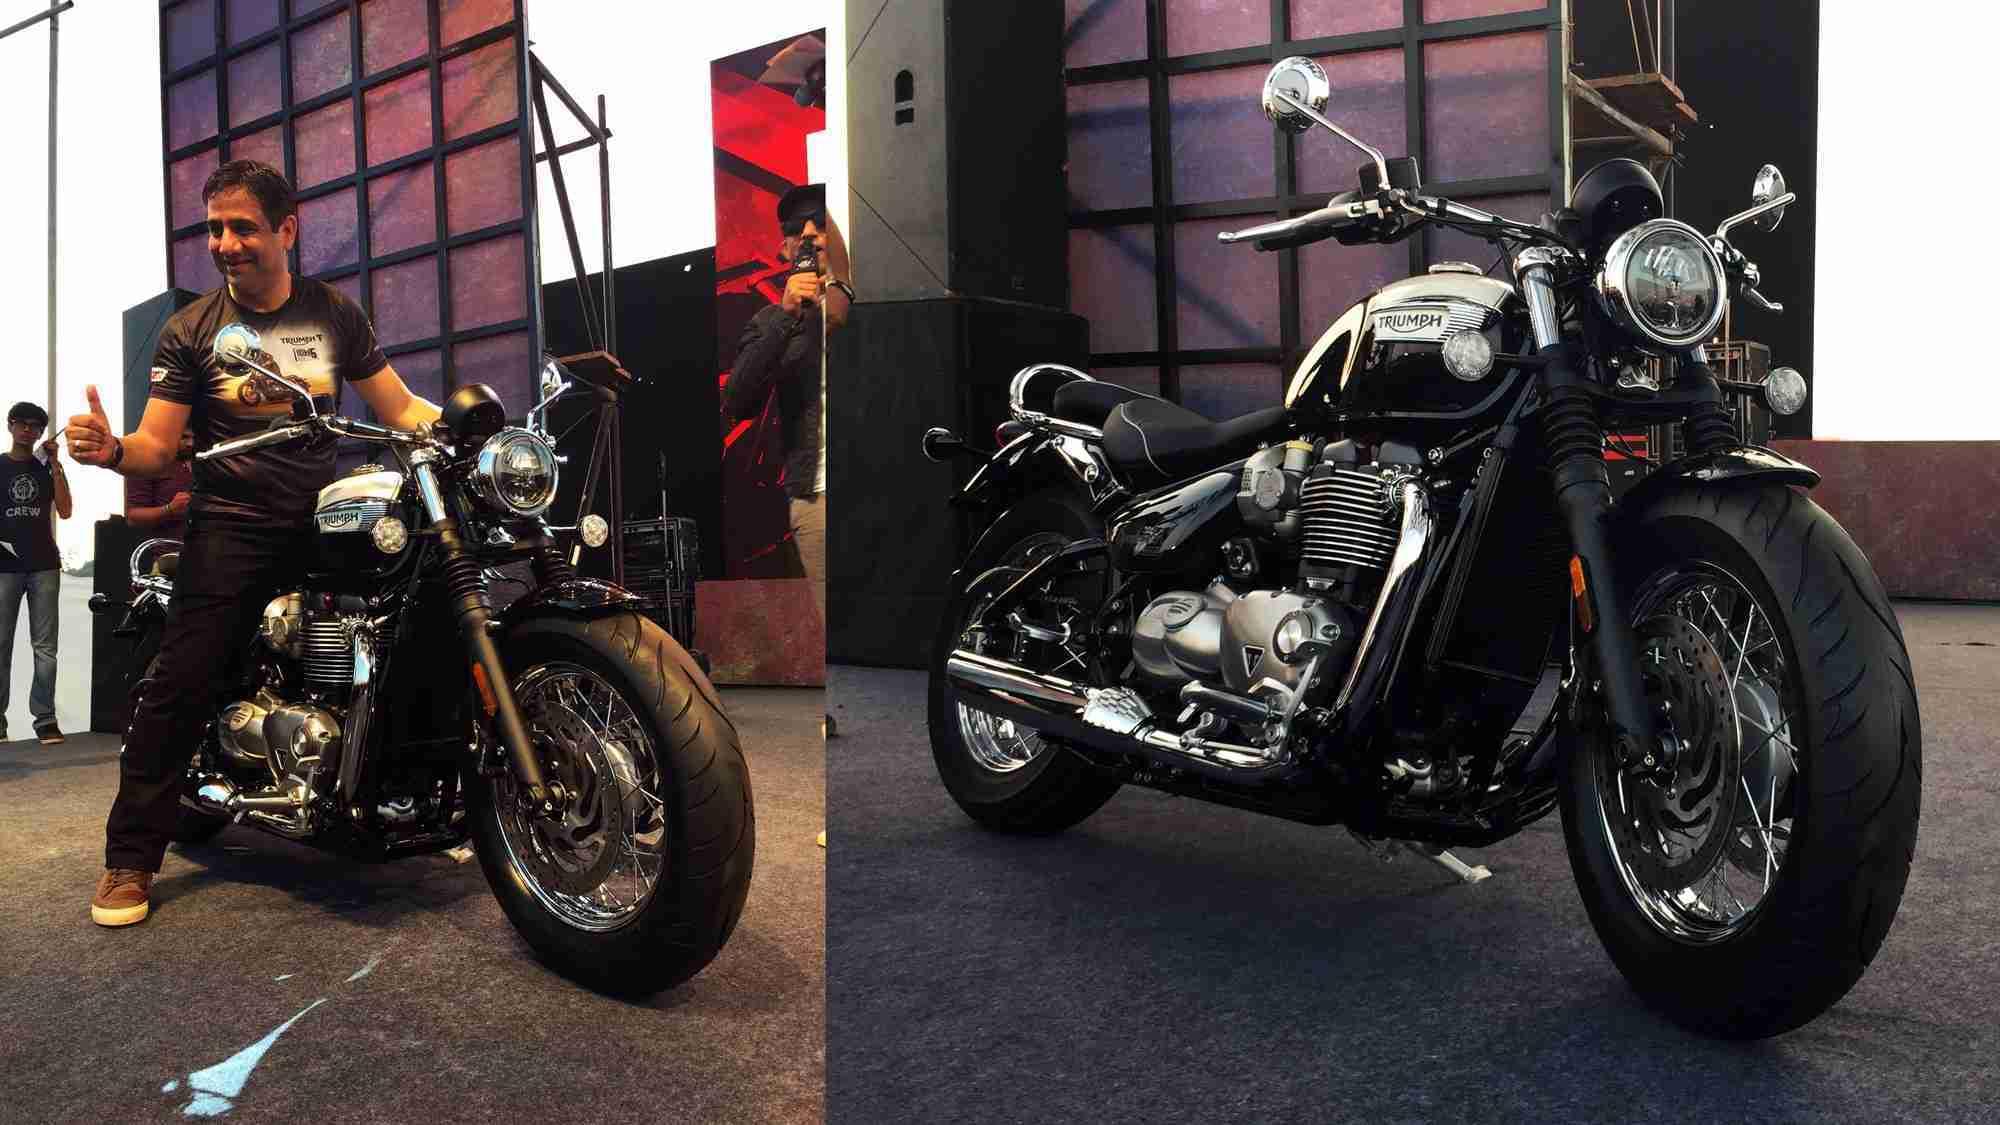 Triumph Bonneville Speedmaster unveiled in India